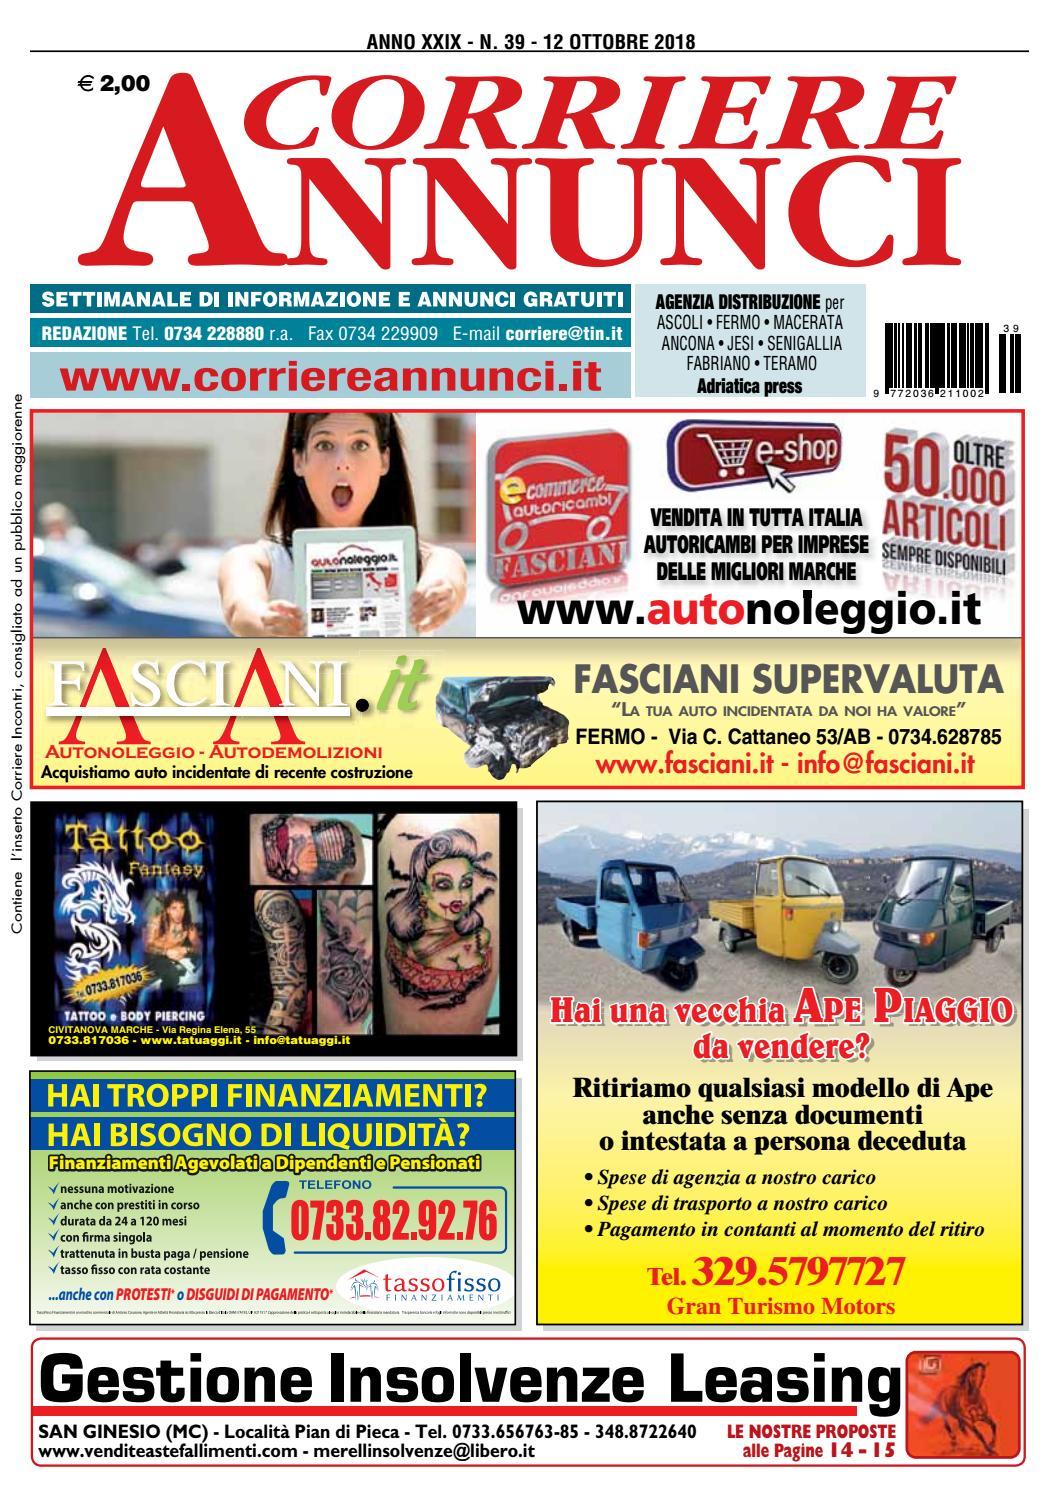 61d4d7810b Corriere 39-2018 by Corriere Annunci - issuu